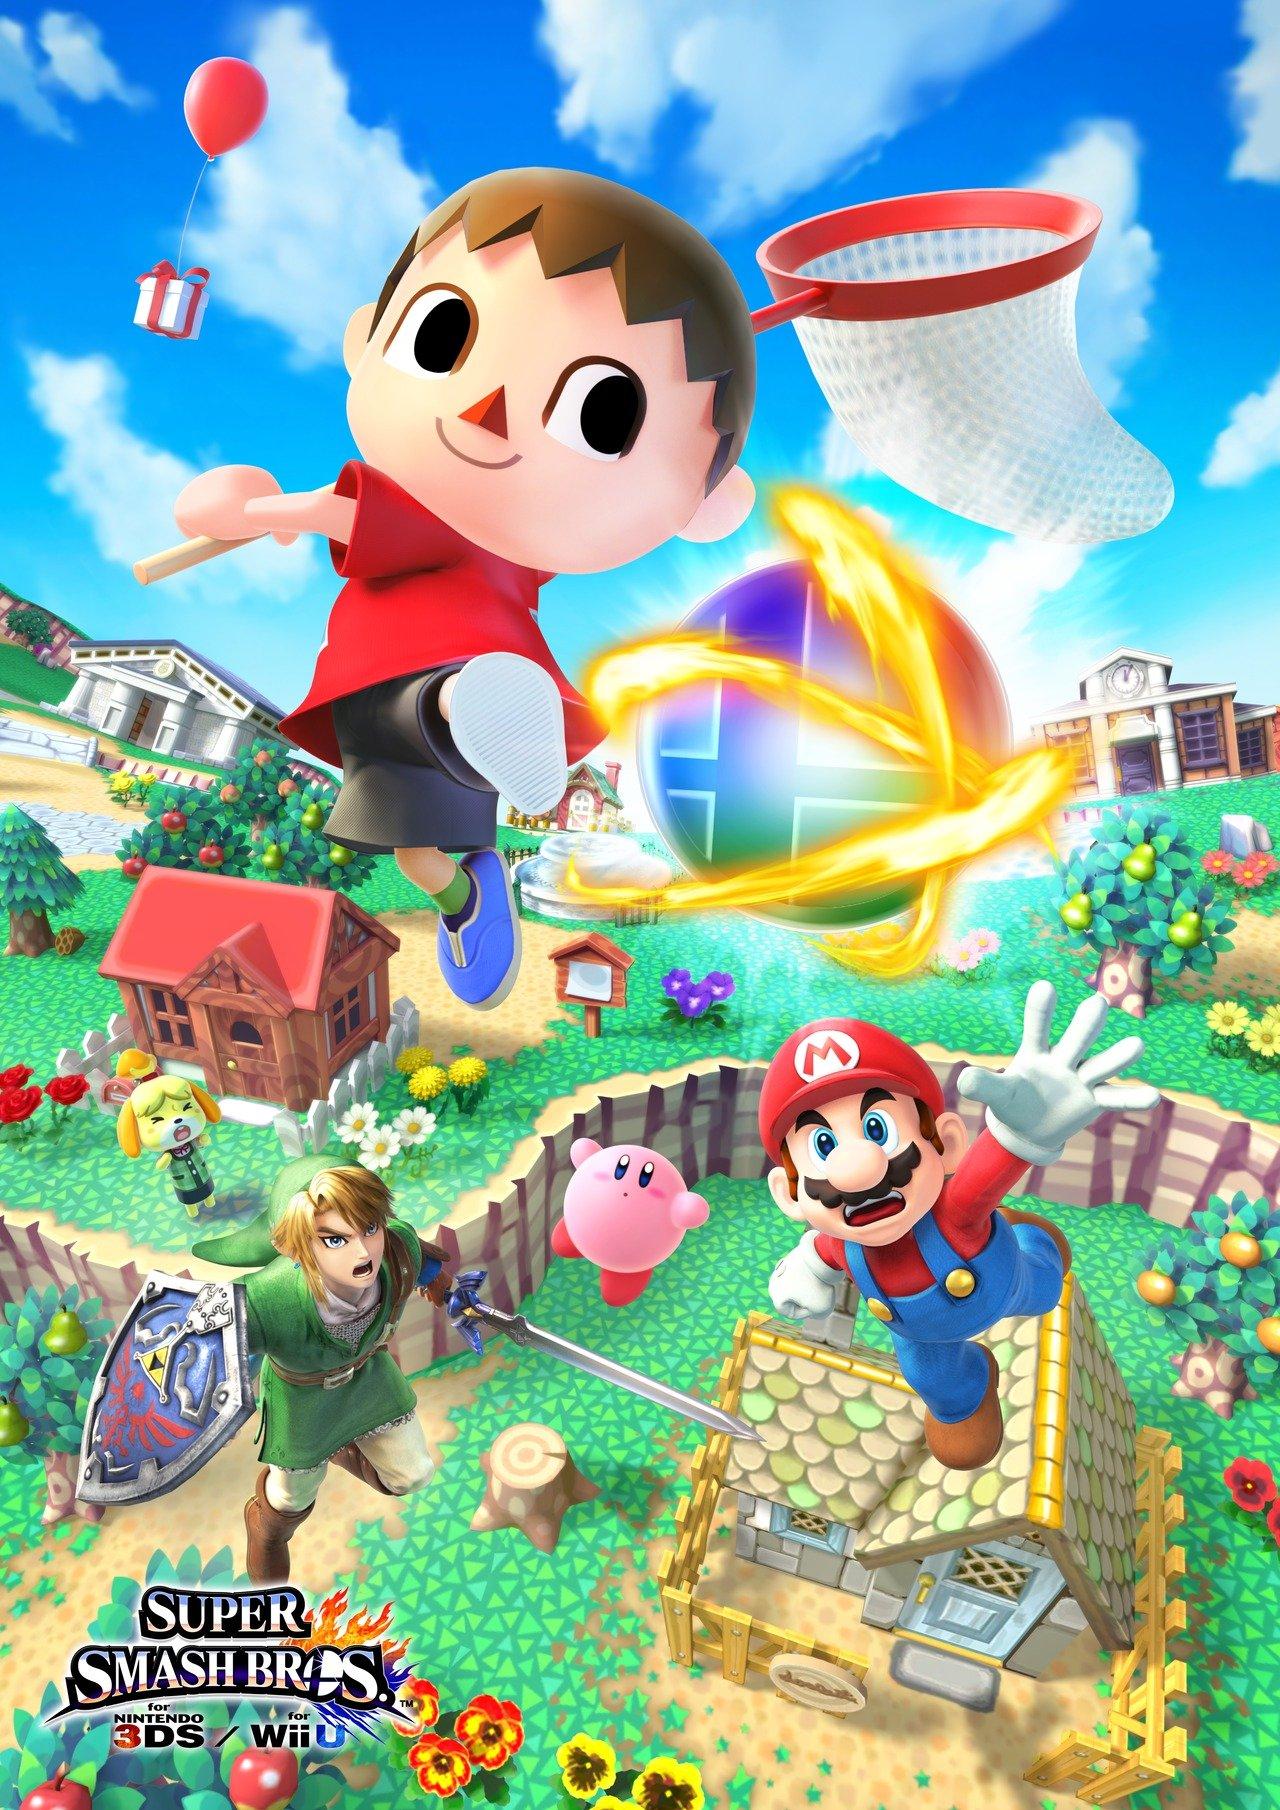 Super Smash Bros Wii U/3DS - Page 2 Super-smash-bros-wii-u-wii-u-wiiu-1370981490-104